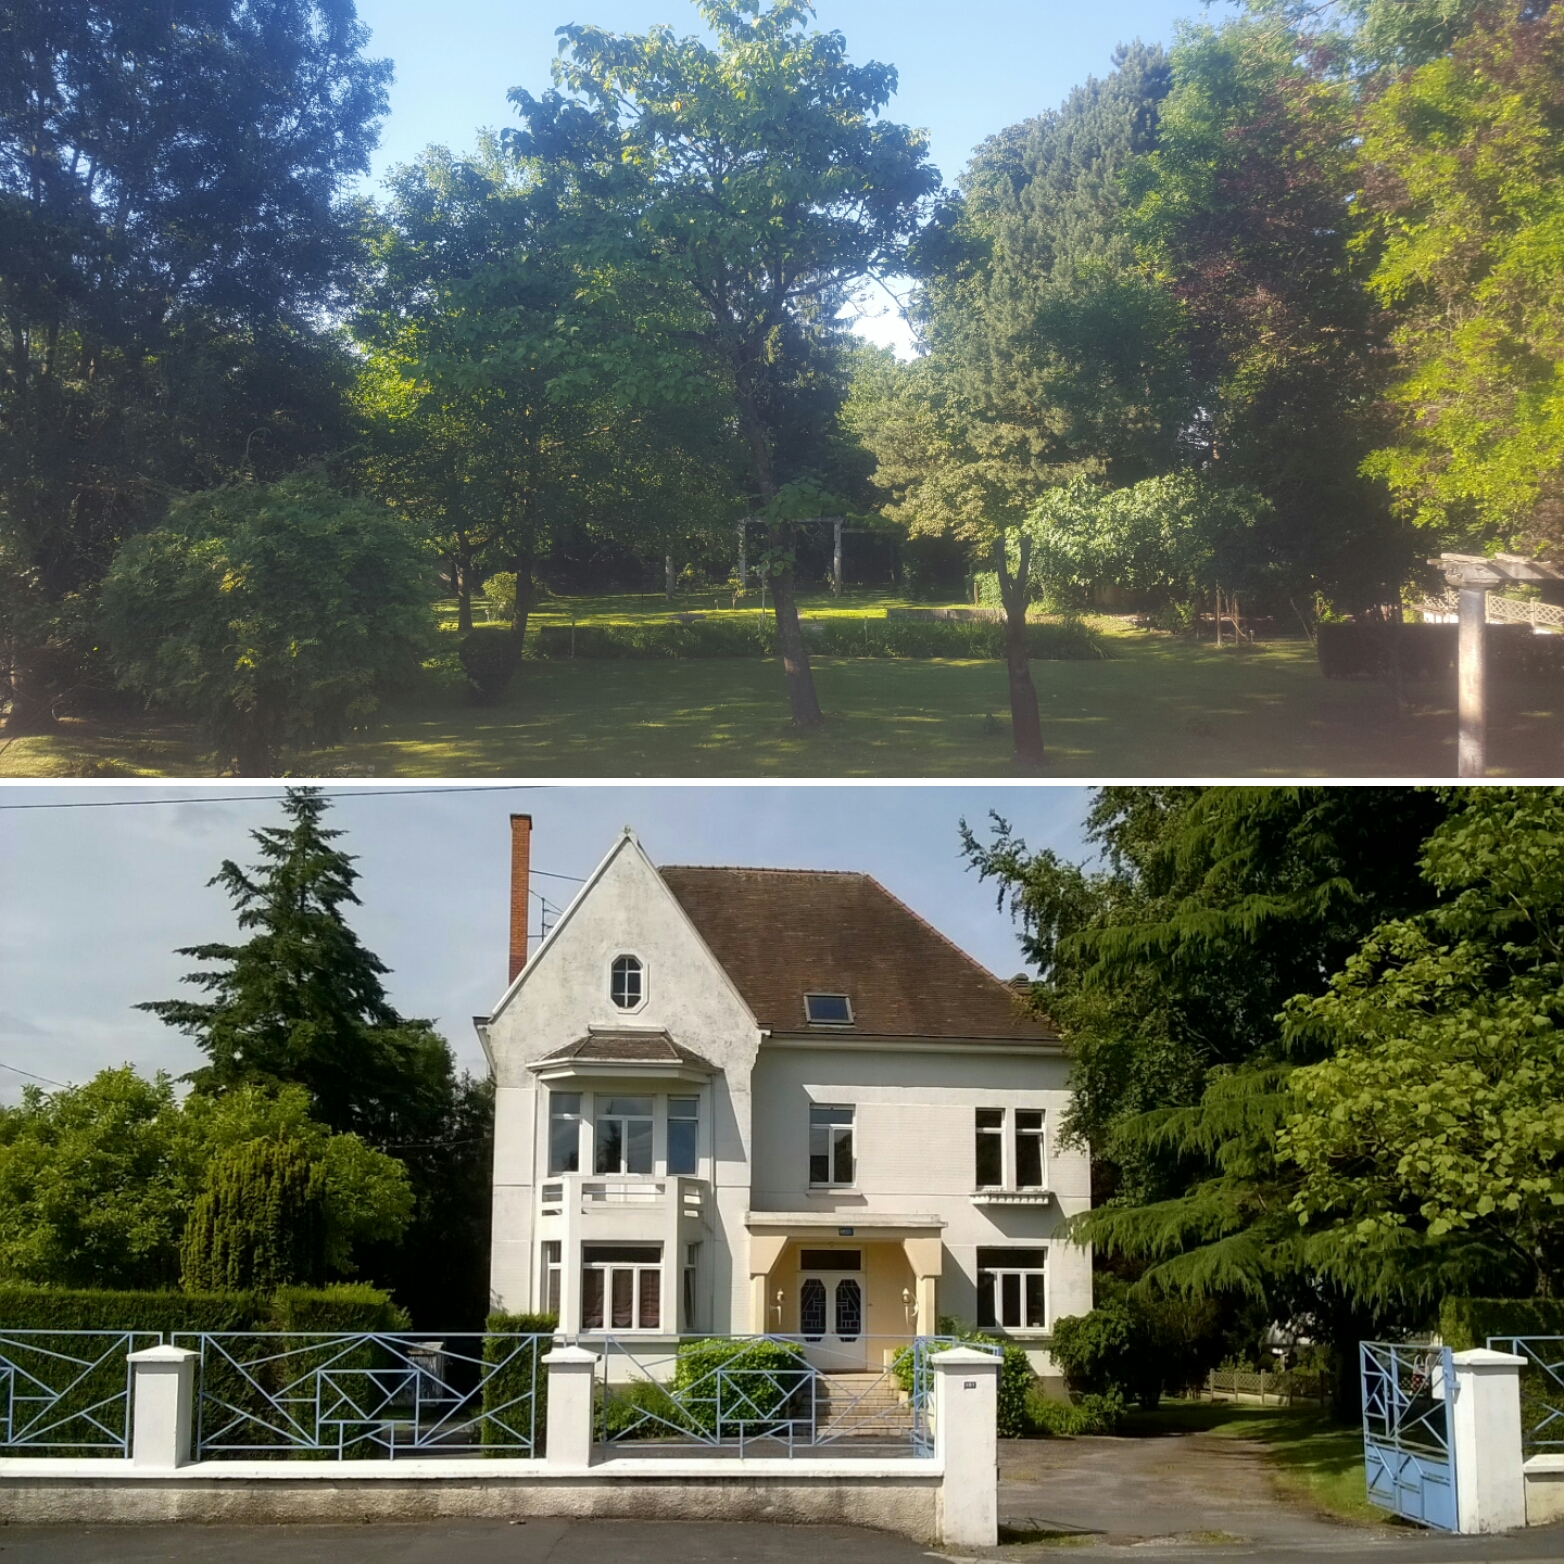 Belle maison de ma tre vendre nord france immo for Immo particulier